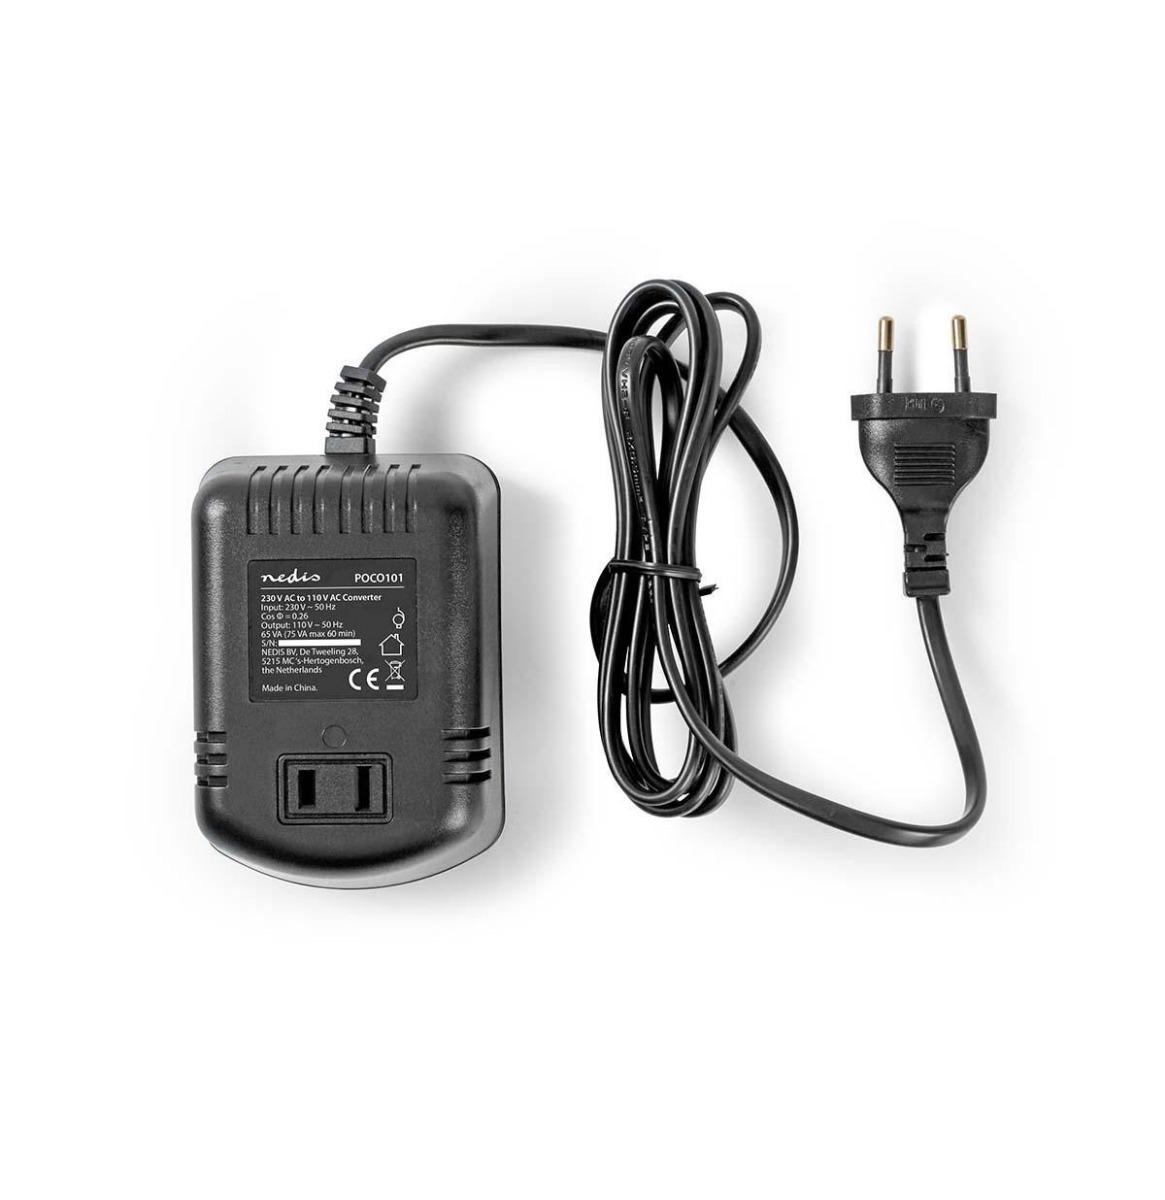 Power Converter - 230 VAC 50 Hz - 75 Watt